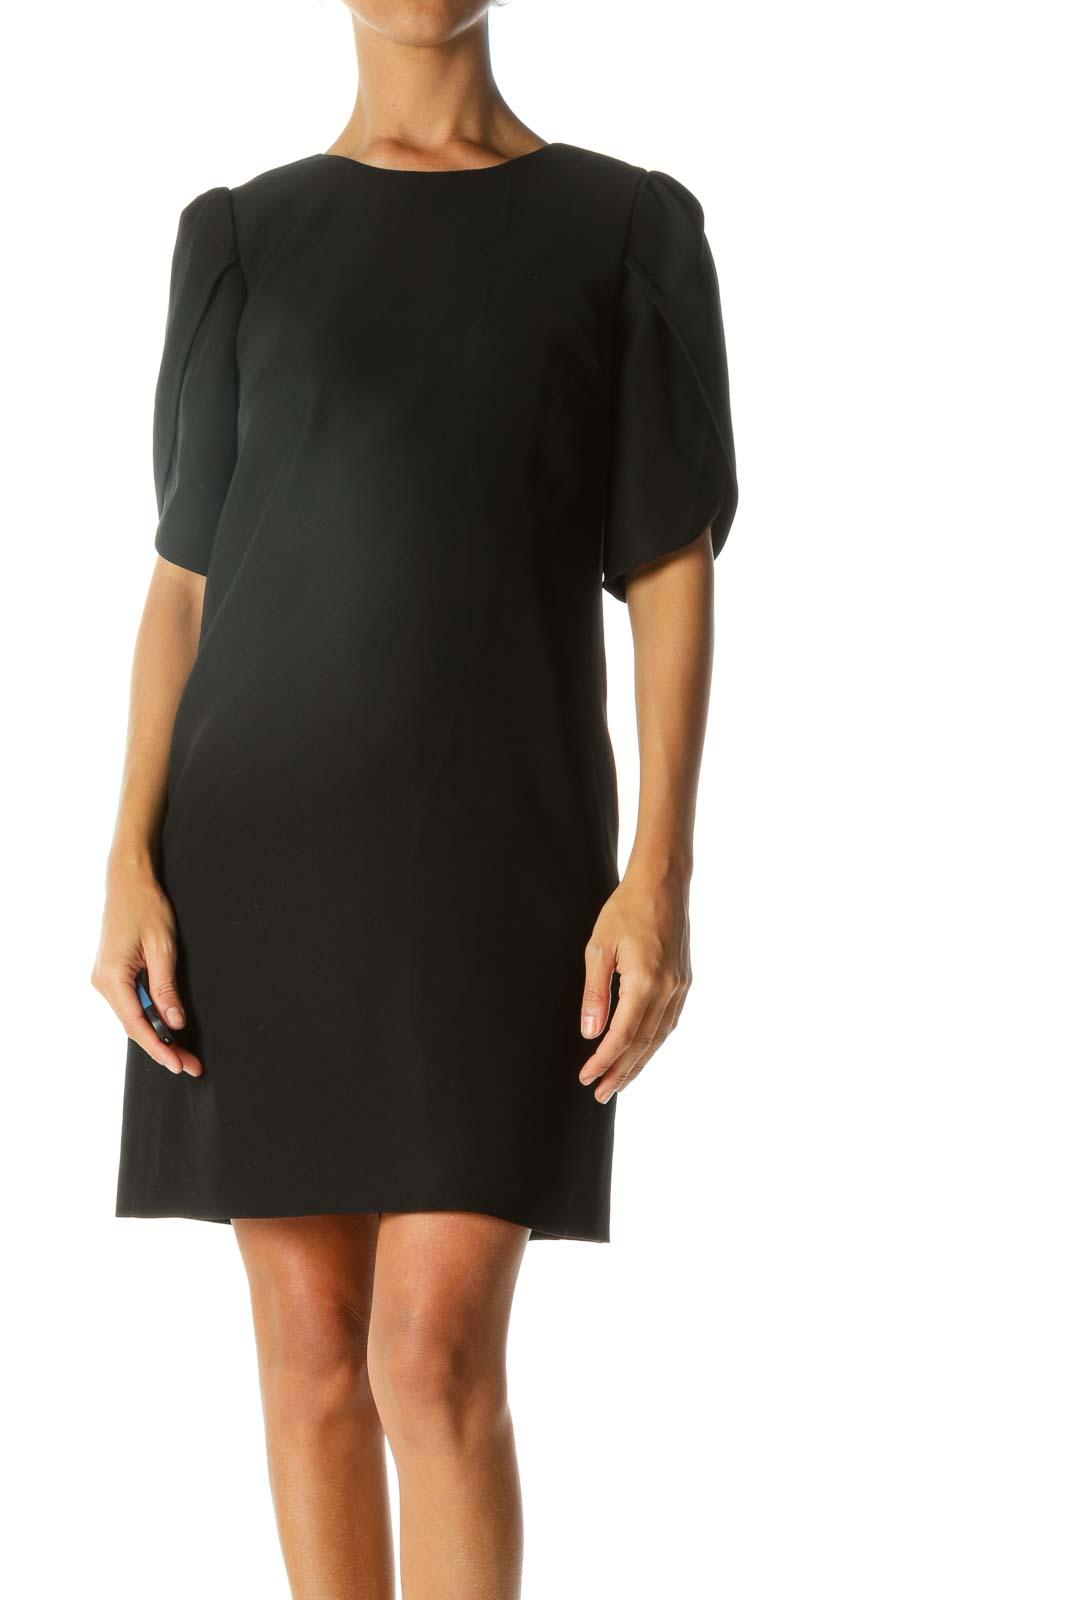 Black Round Neck Flared-Short-Sleeves Cocktail Dress Front